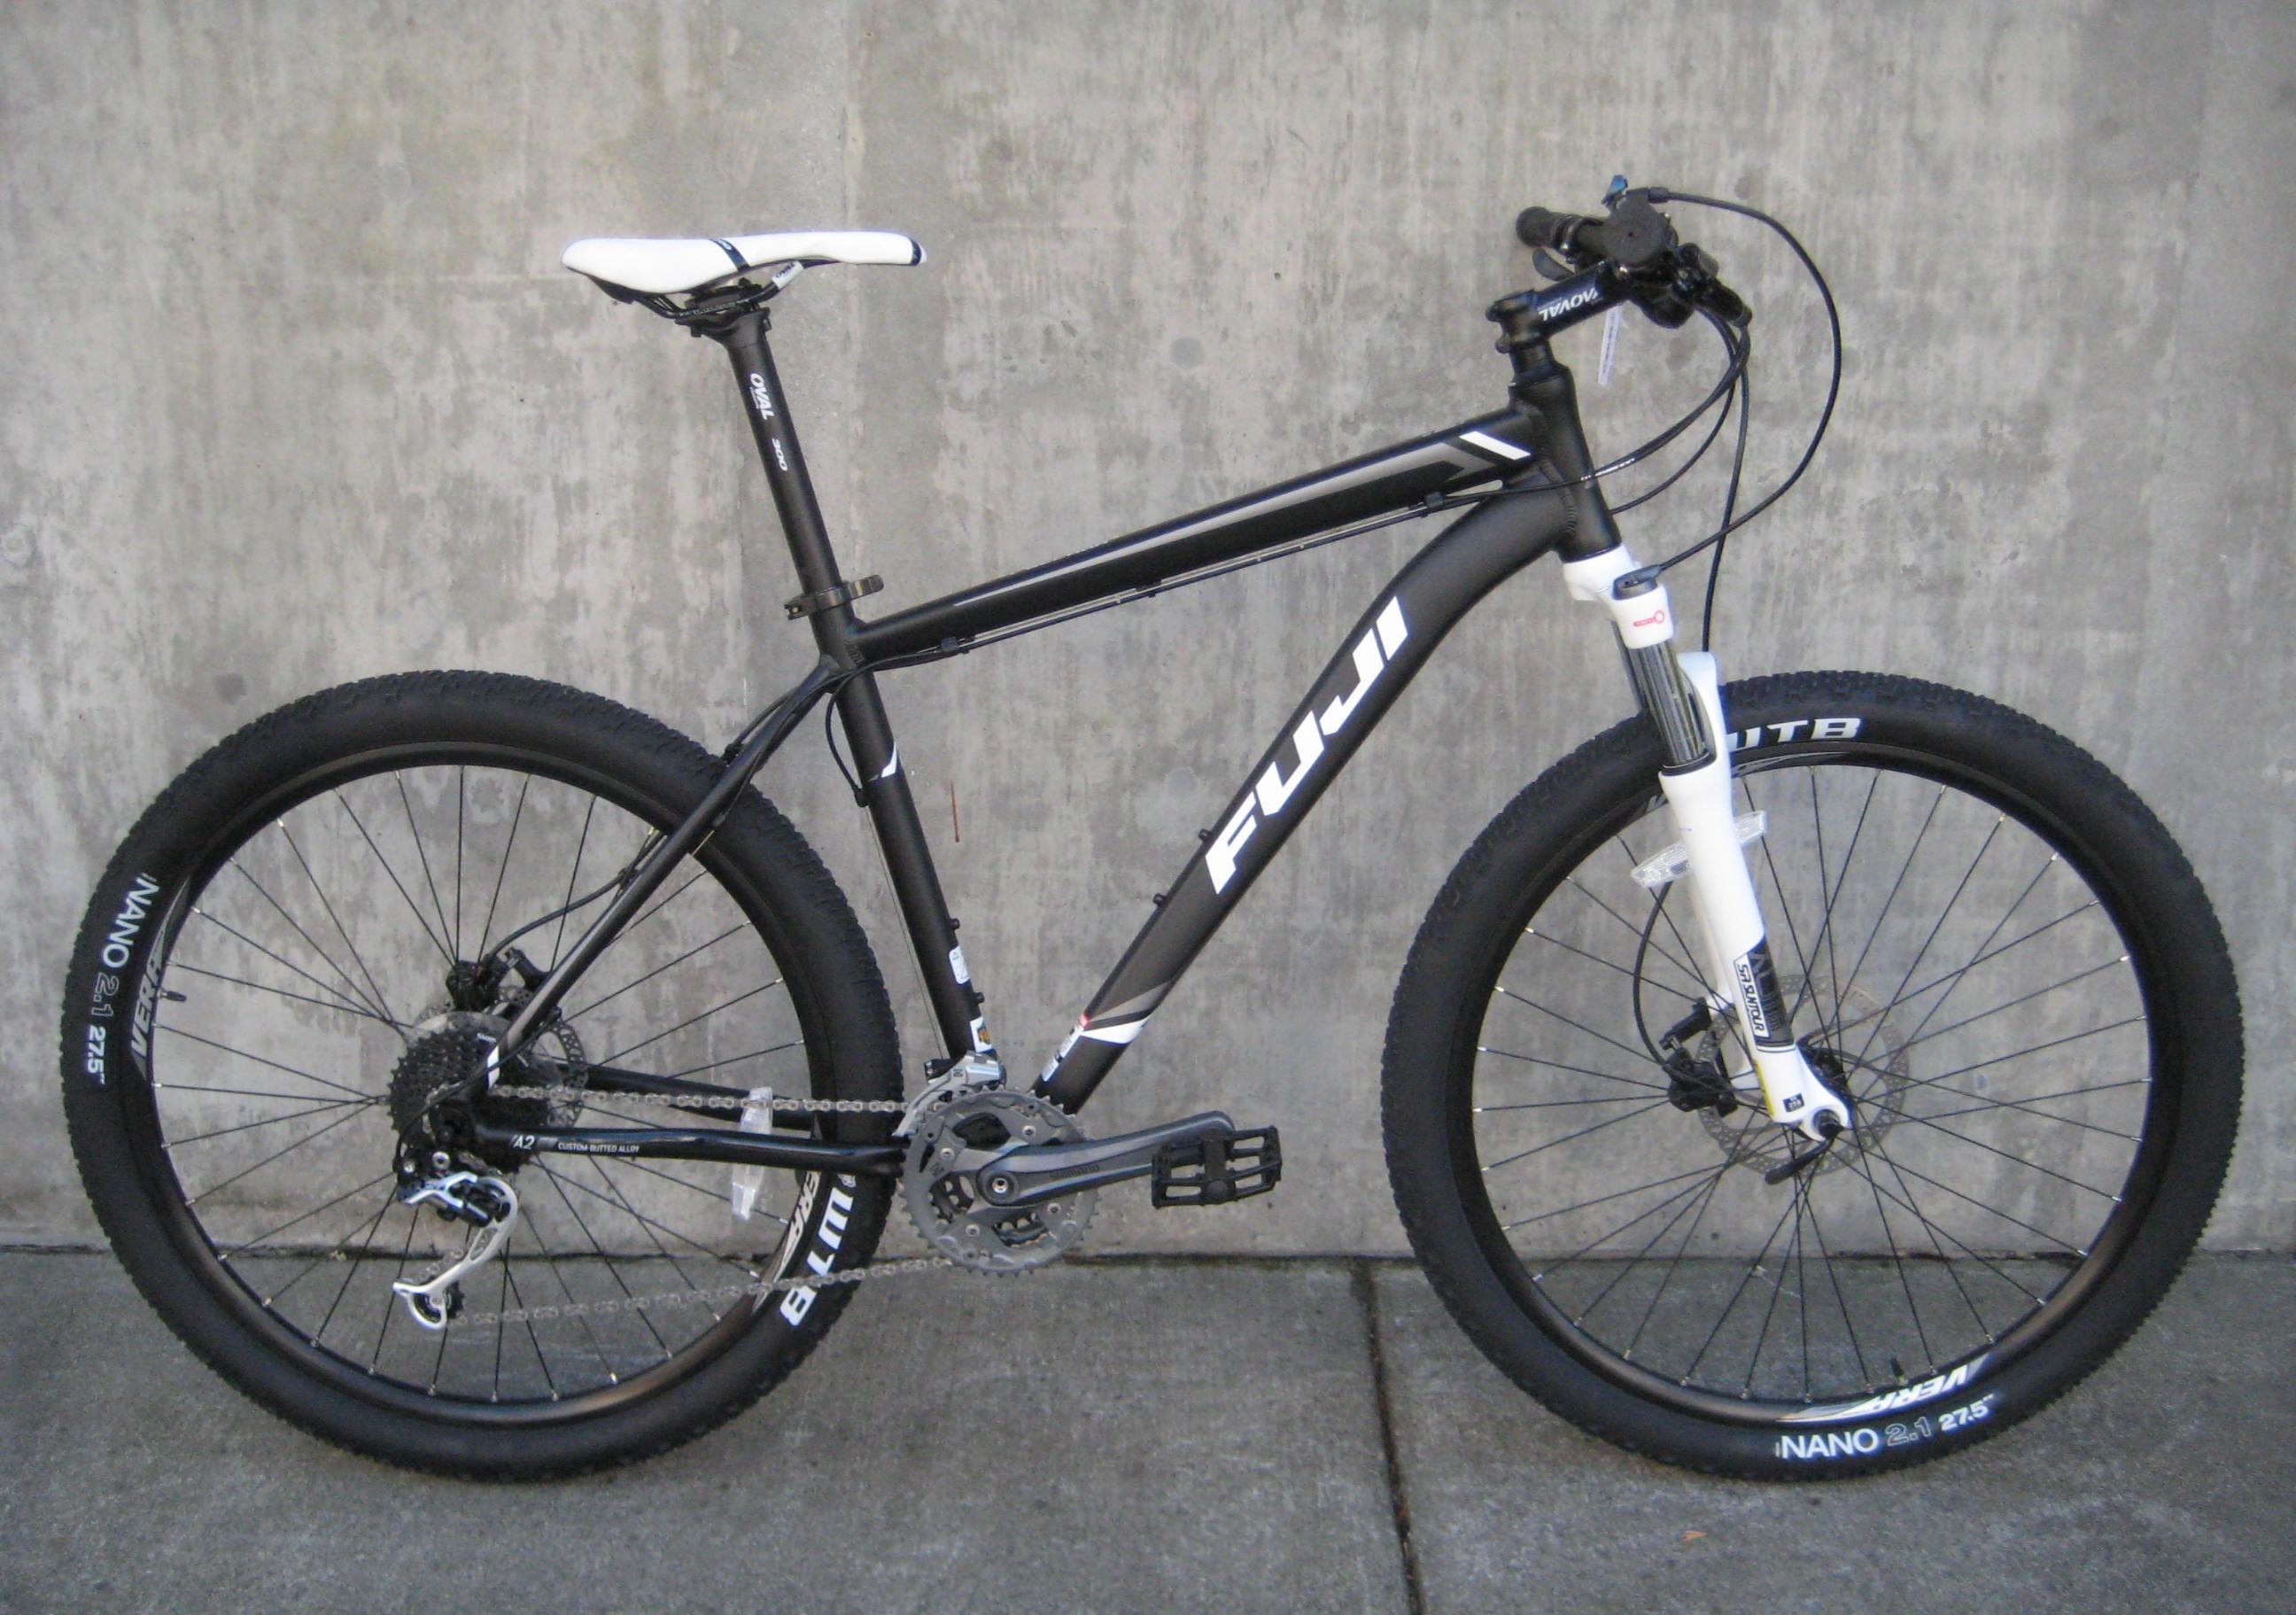 Fuji Nevada 1 3, 1 5 and 1 7 mountain bikes at Classic Cycle